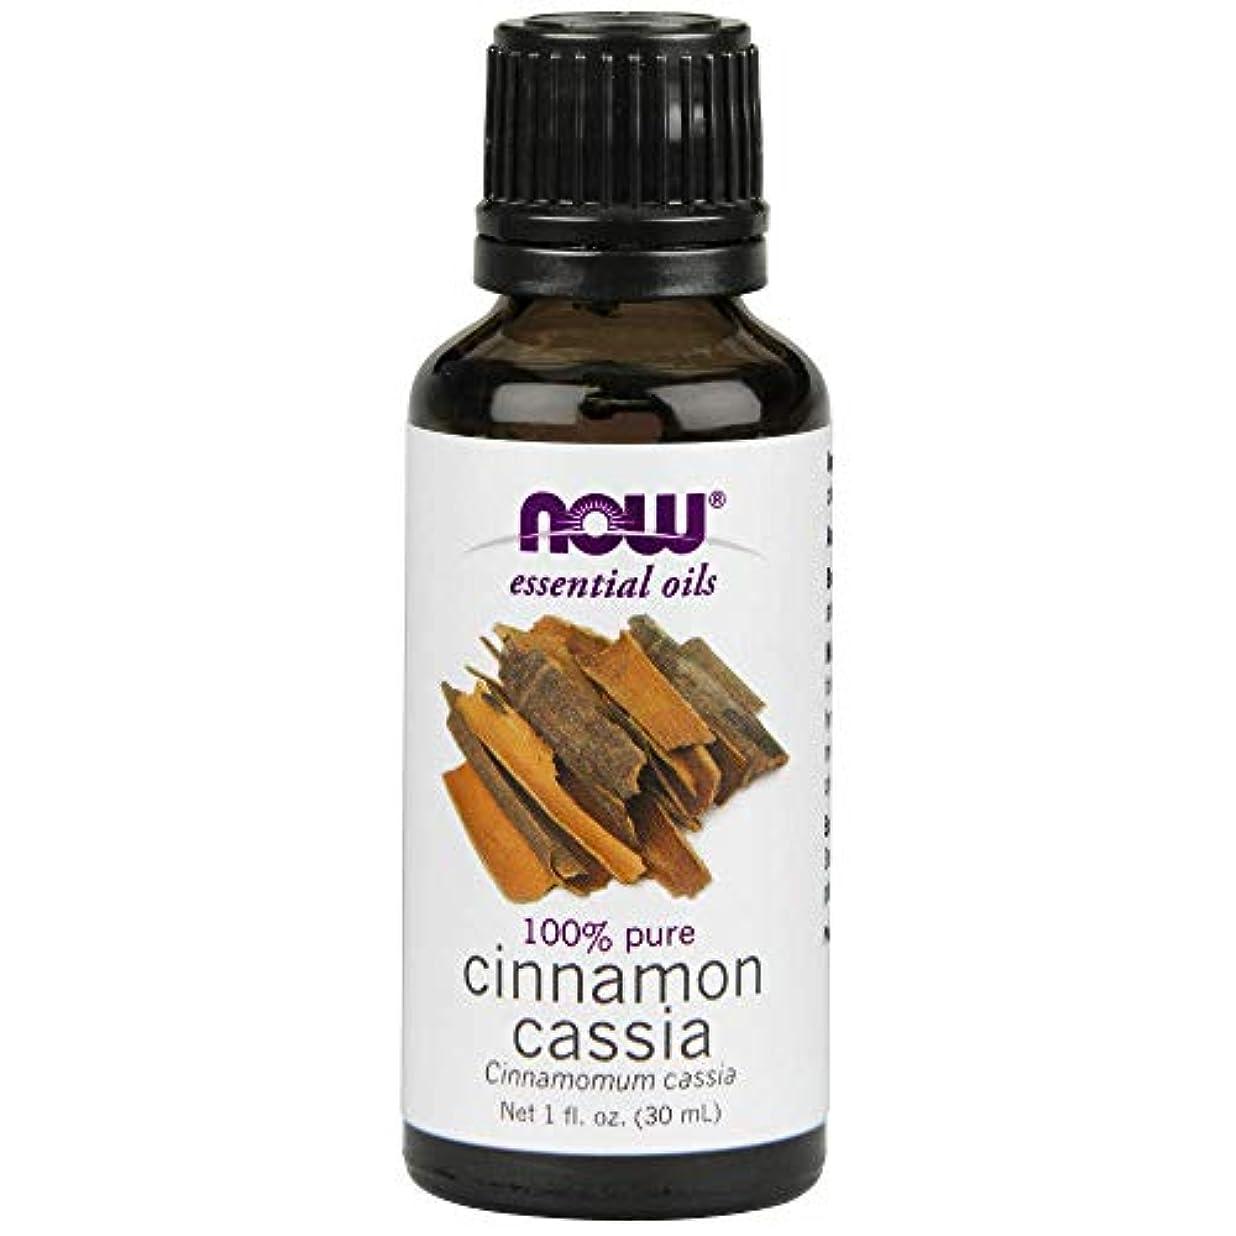 衝動遠近法車両Now - Cinnamon Cassia Oil 100% Pure 1 oz (30 ml) [並行輸入品]